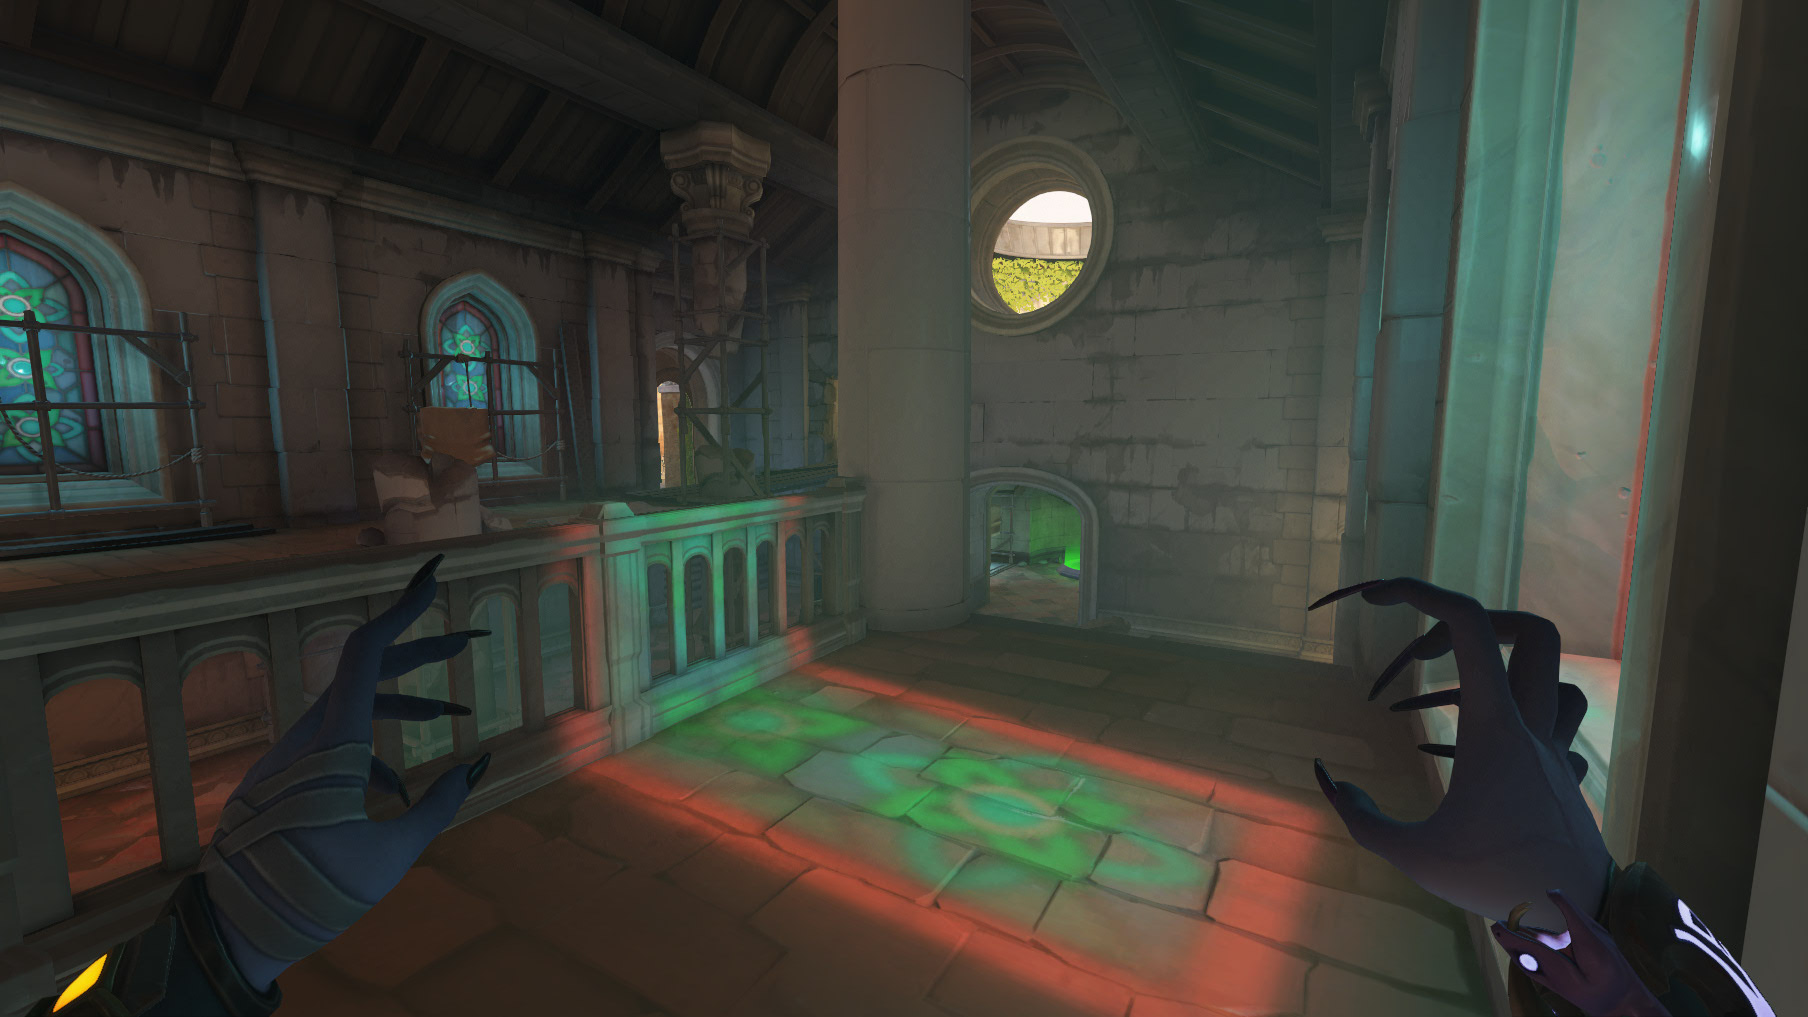 Nouvelle map Deathmatch Overwatch